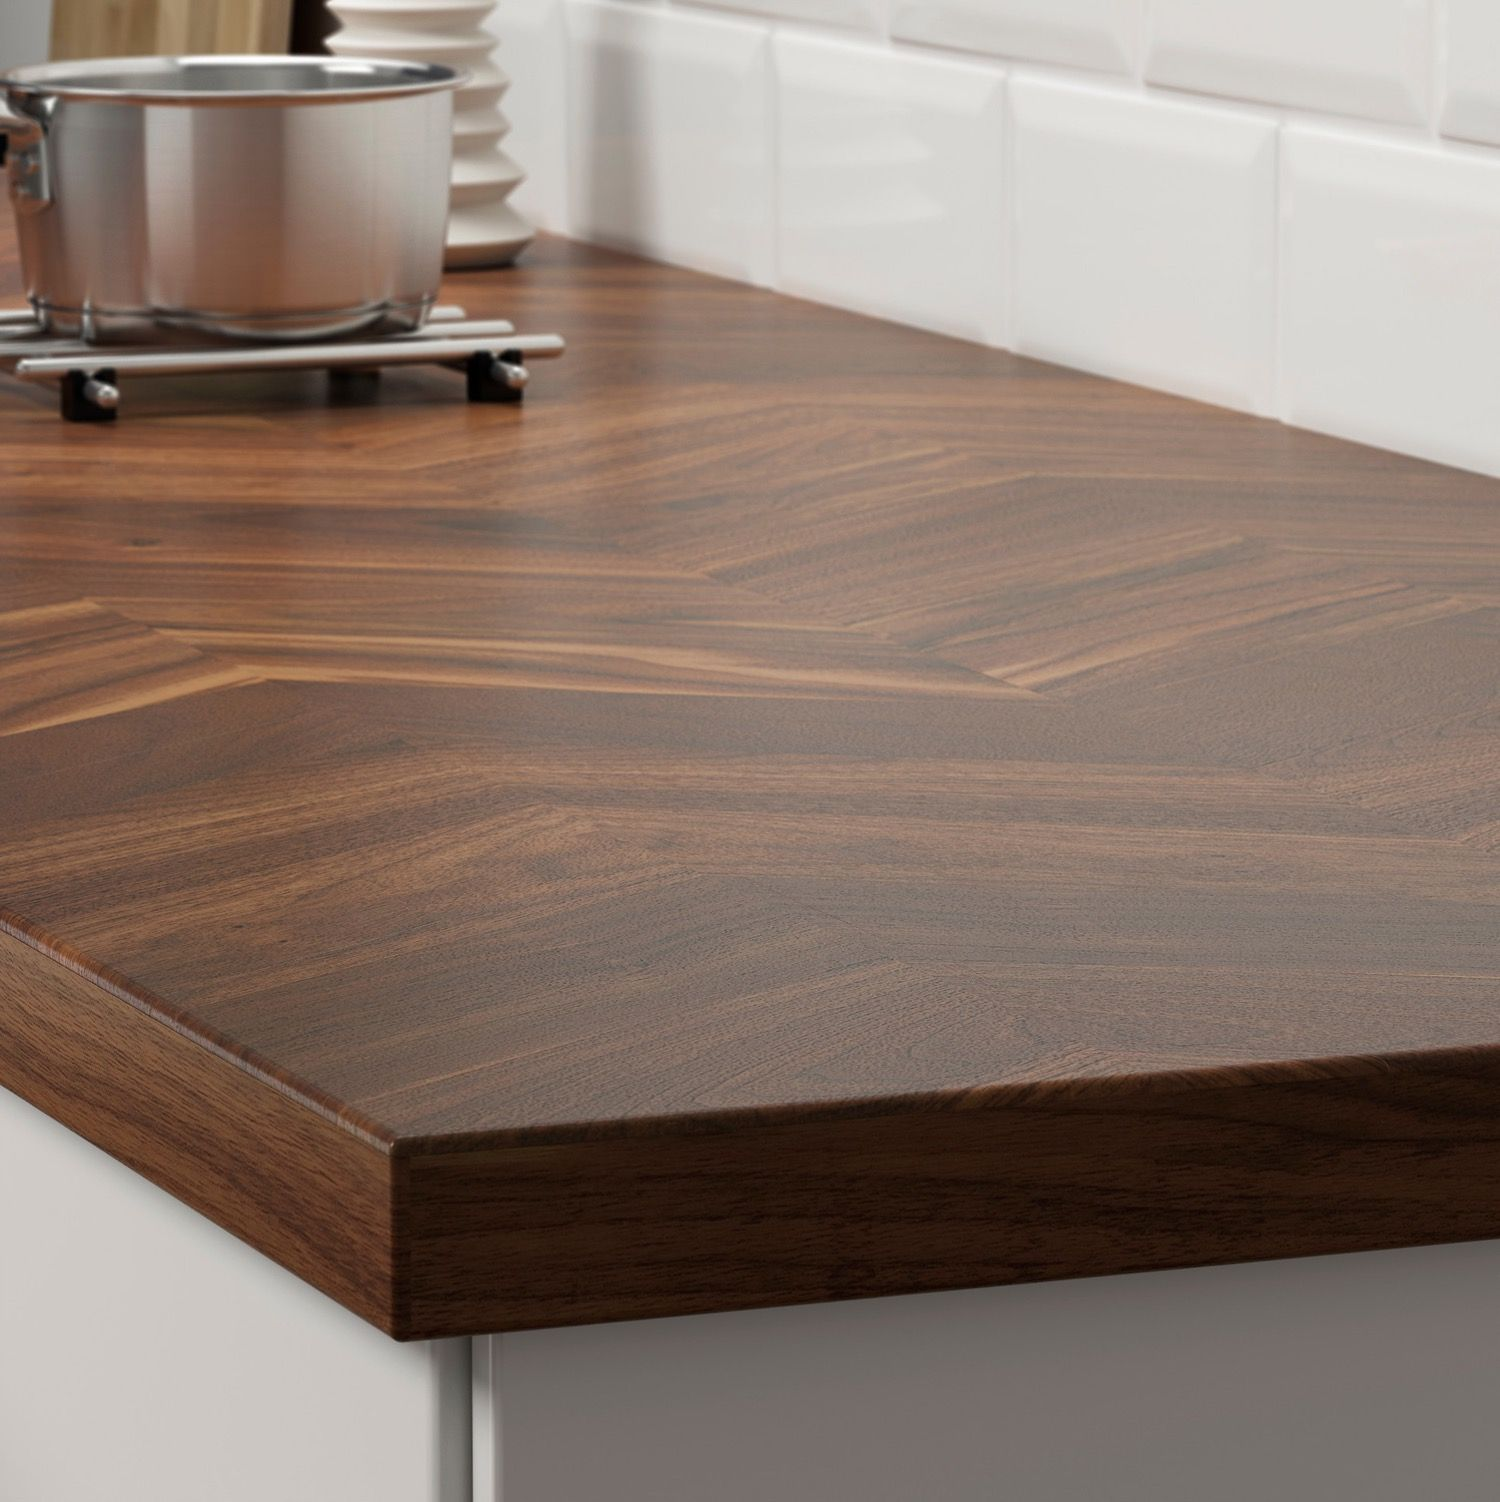 9 Barkaboda Wood Countertop Karlby Countertop